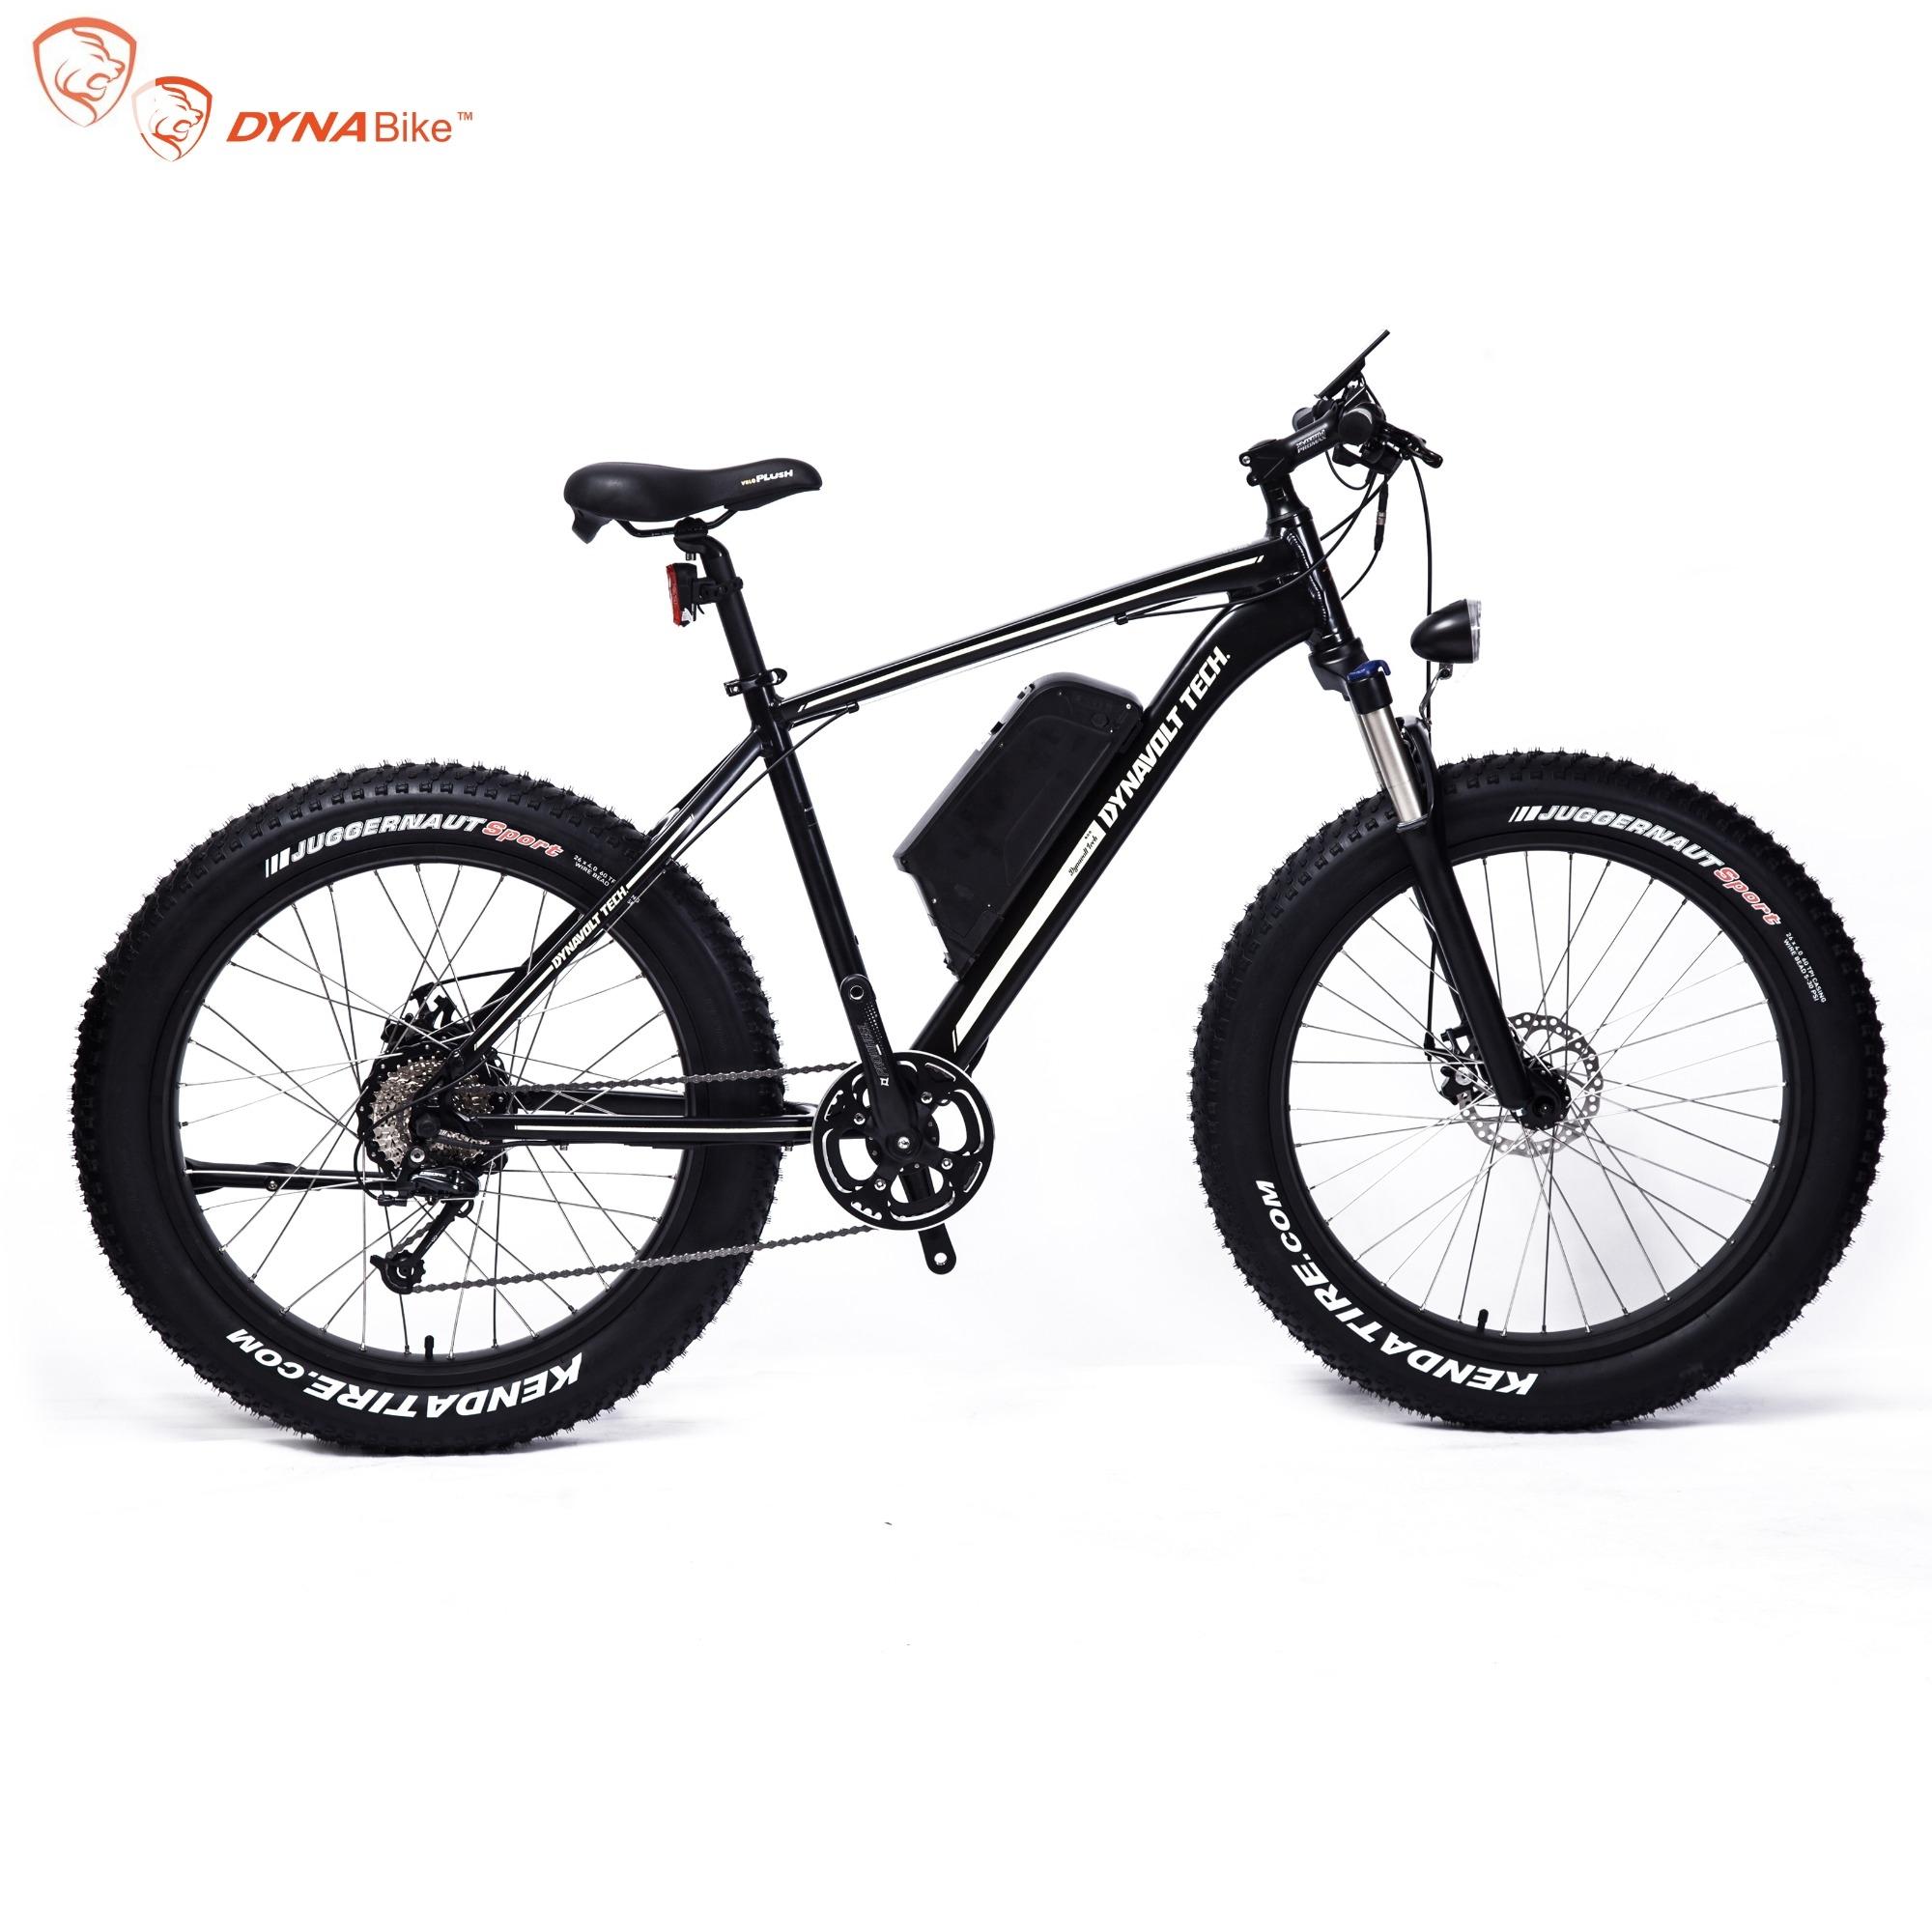 K1 5 Electric Fat Bike